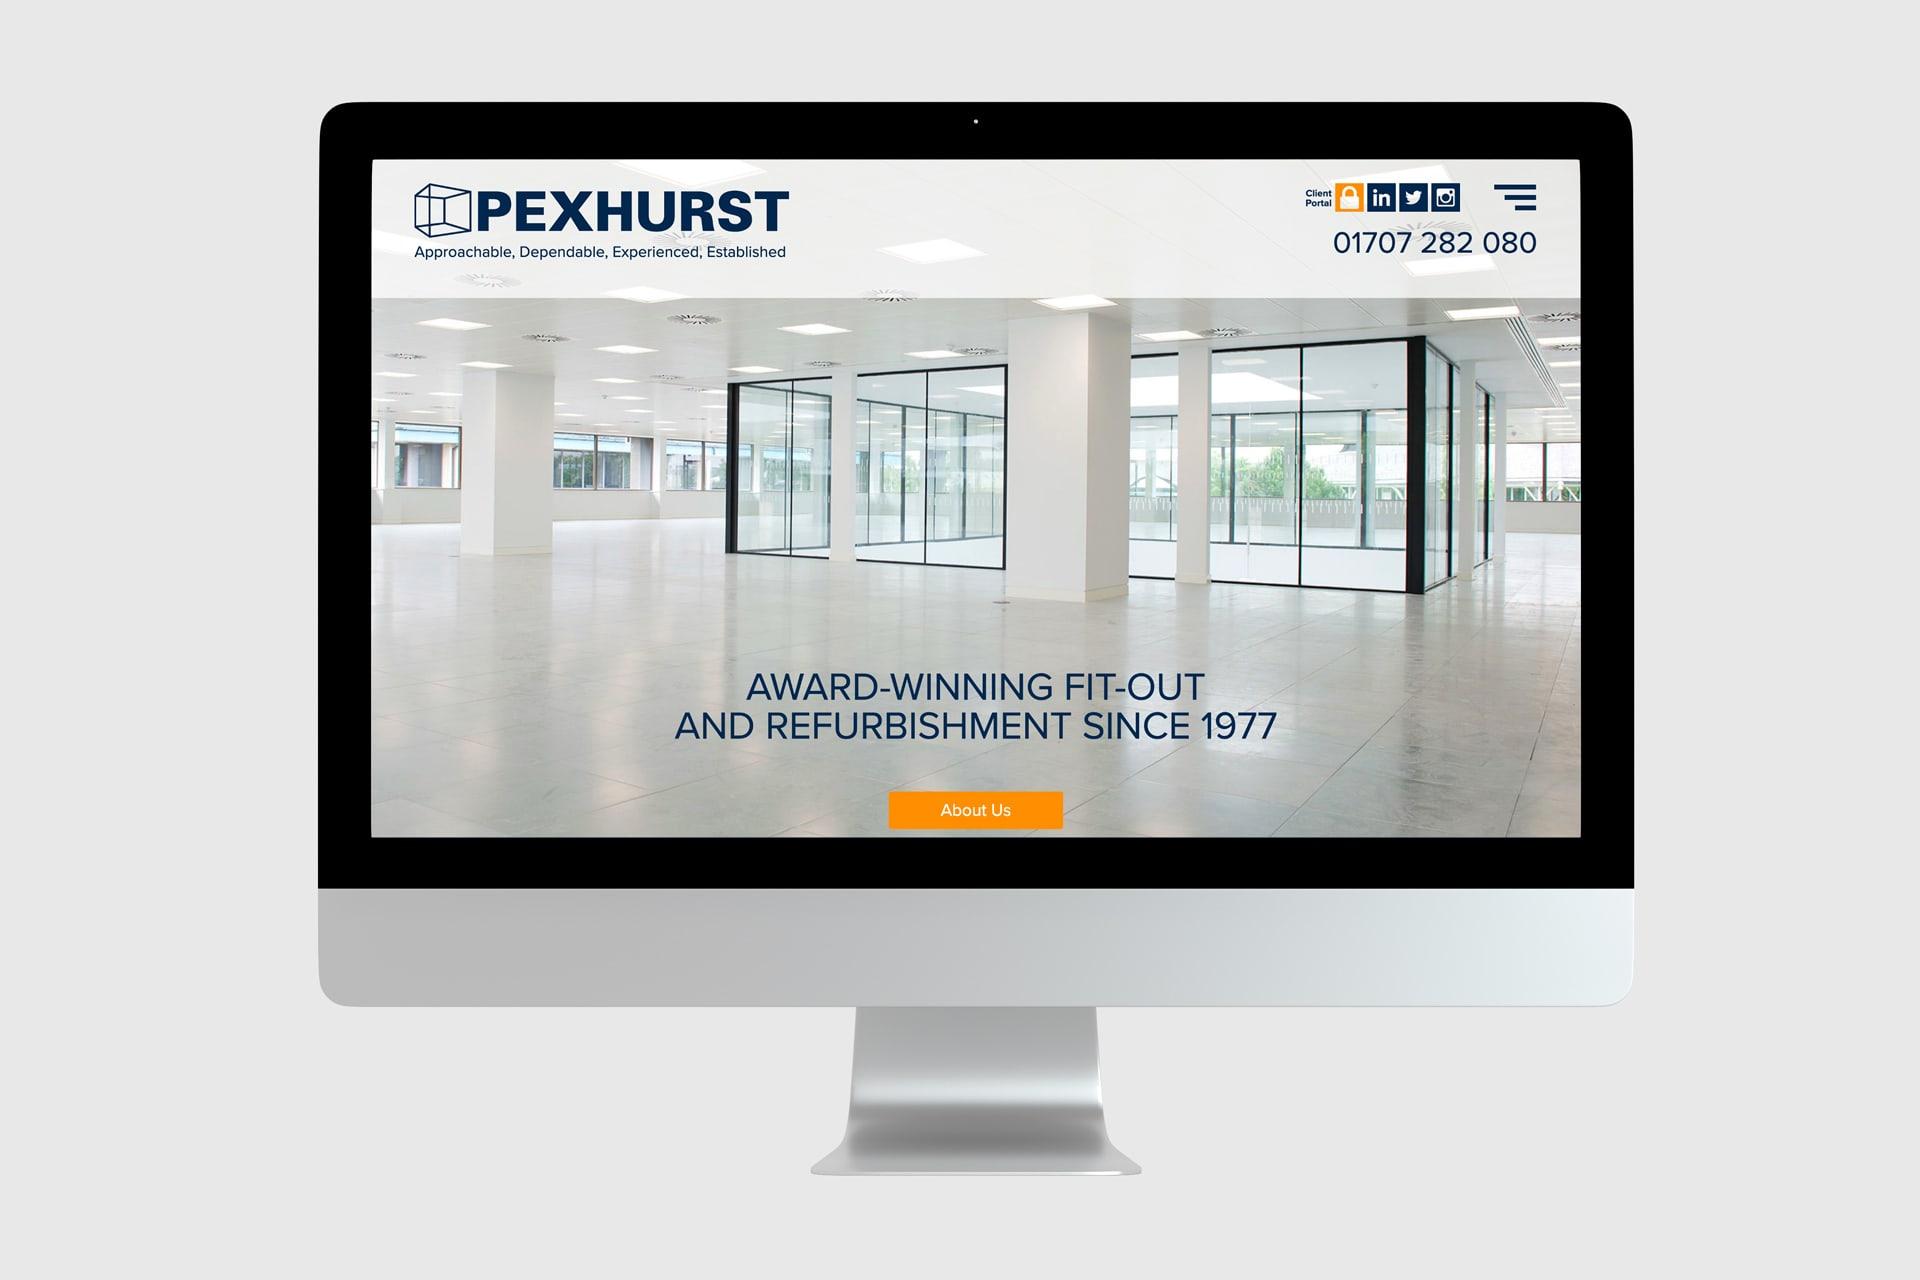 Pexhurst New Website Homepage